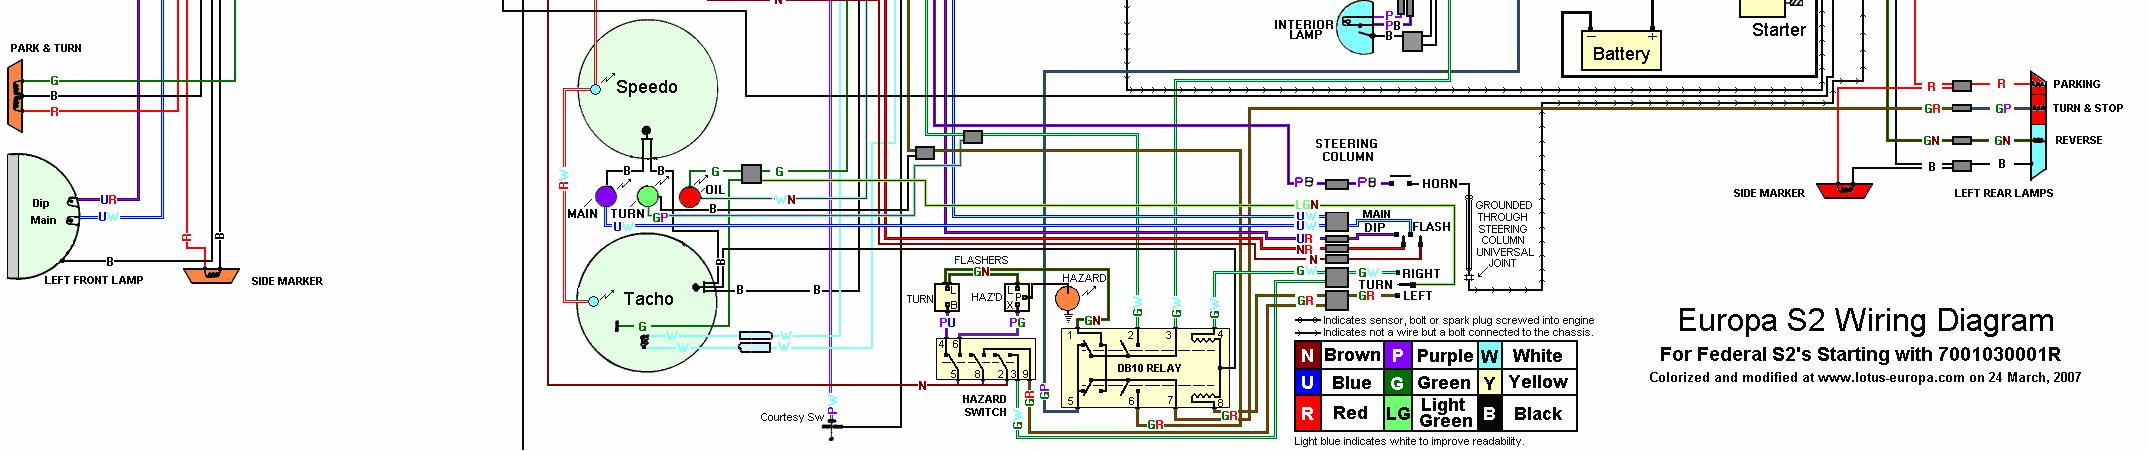 Warlock Wiring Schematic Library Alarm Diagram Audiovox Car Prestige 230i